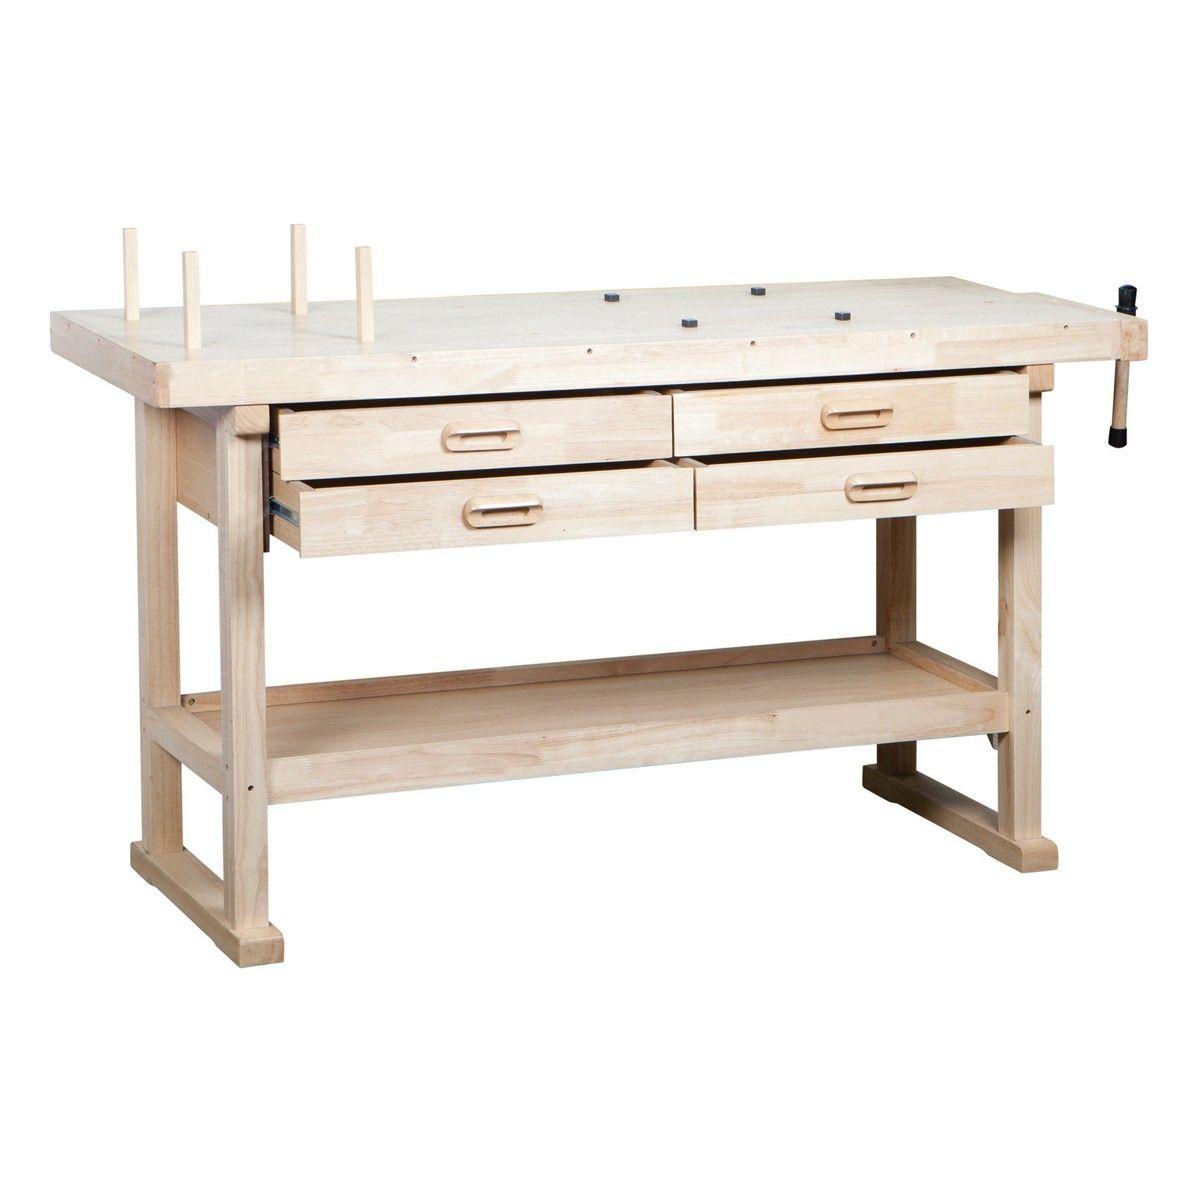 60 in. 4 drawer hardwood workbench | drawers, storage drawers and